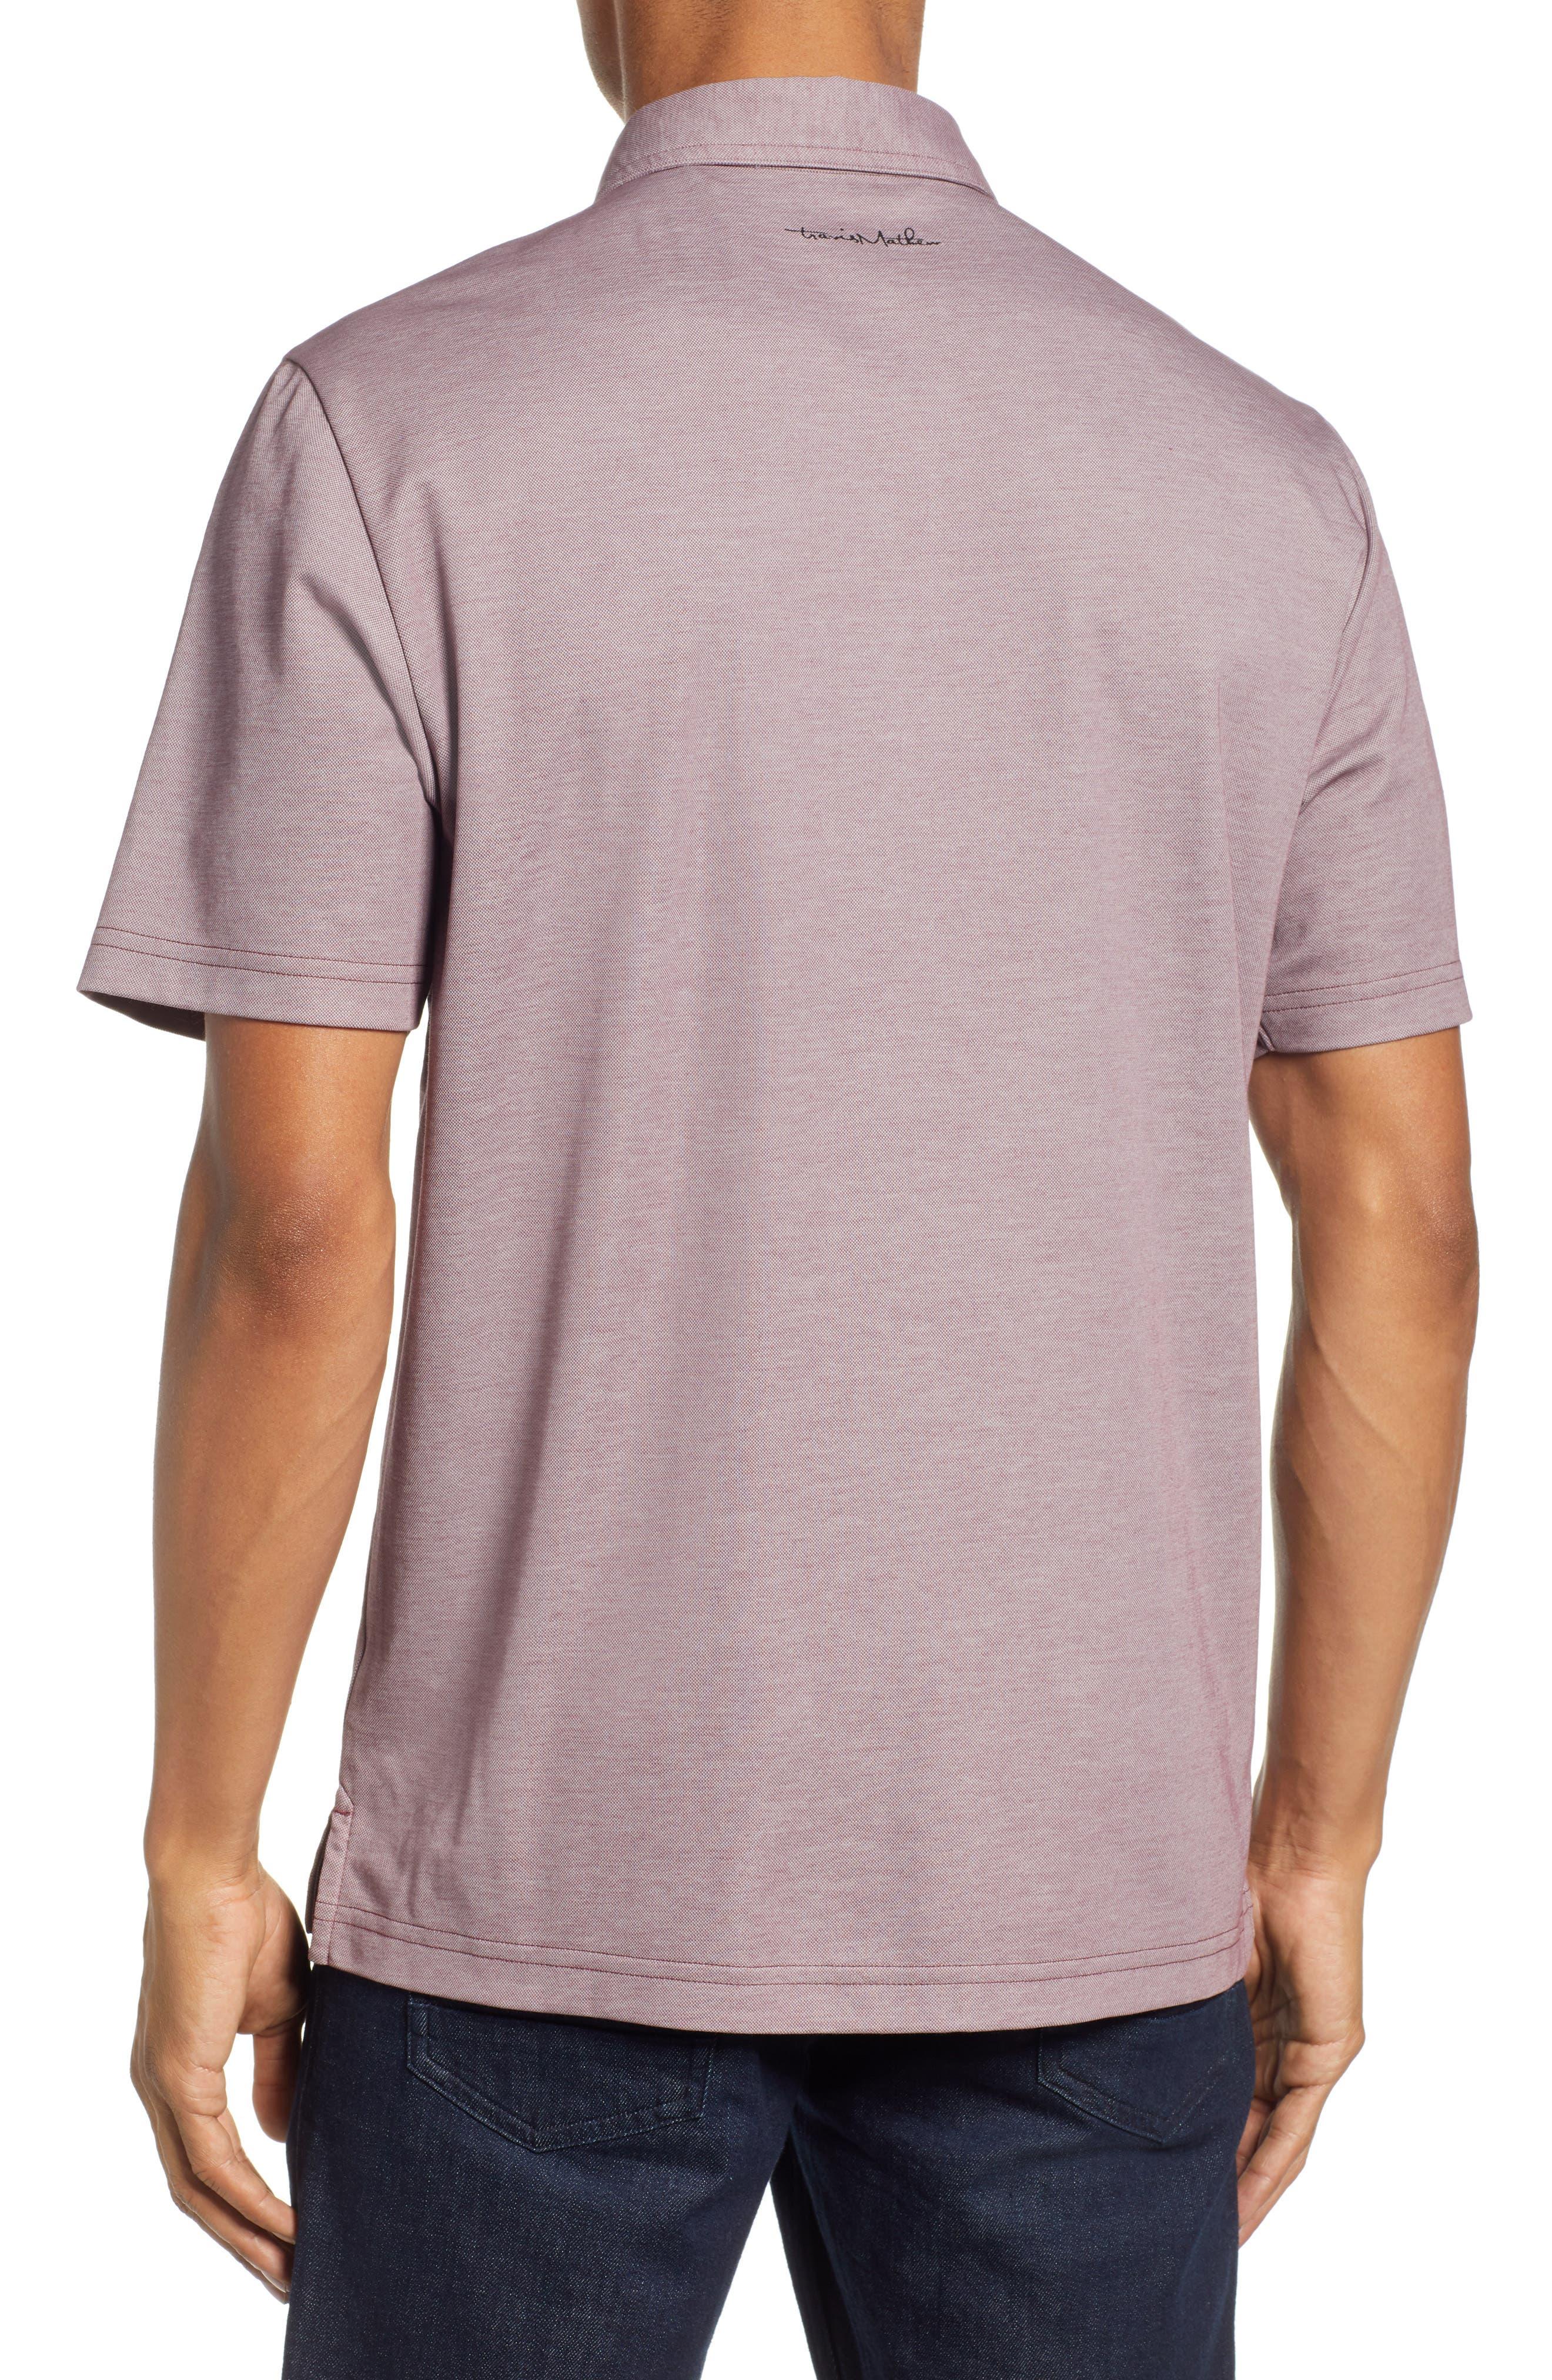 TRAVIS MATHEW,                             Tonk Regular Fit Polo Shirt,                             Alternate thumbnail 2, color,                             600